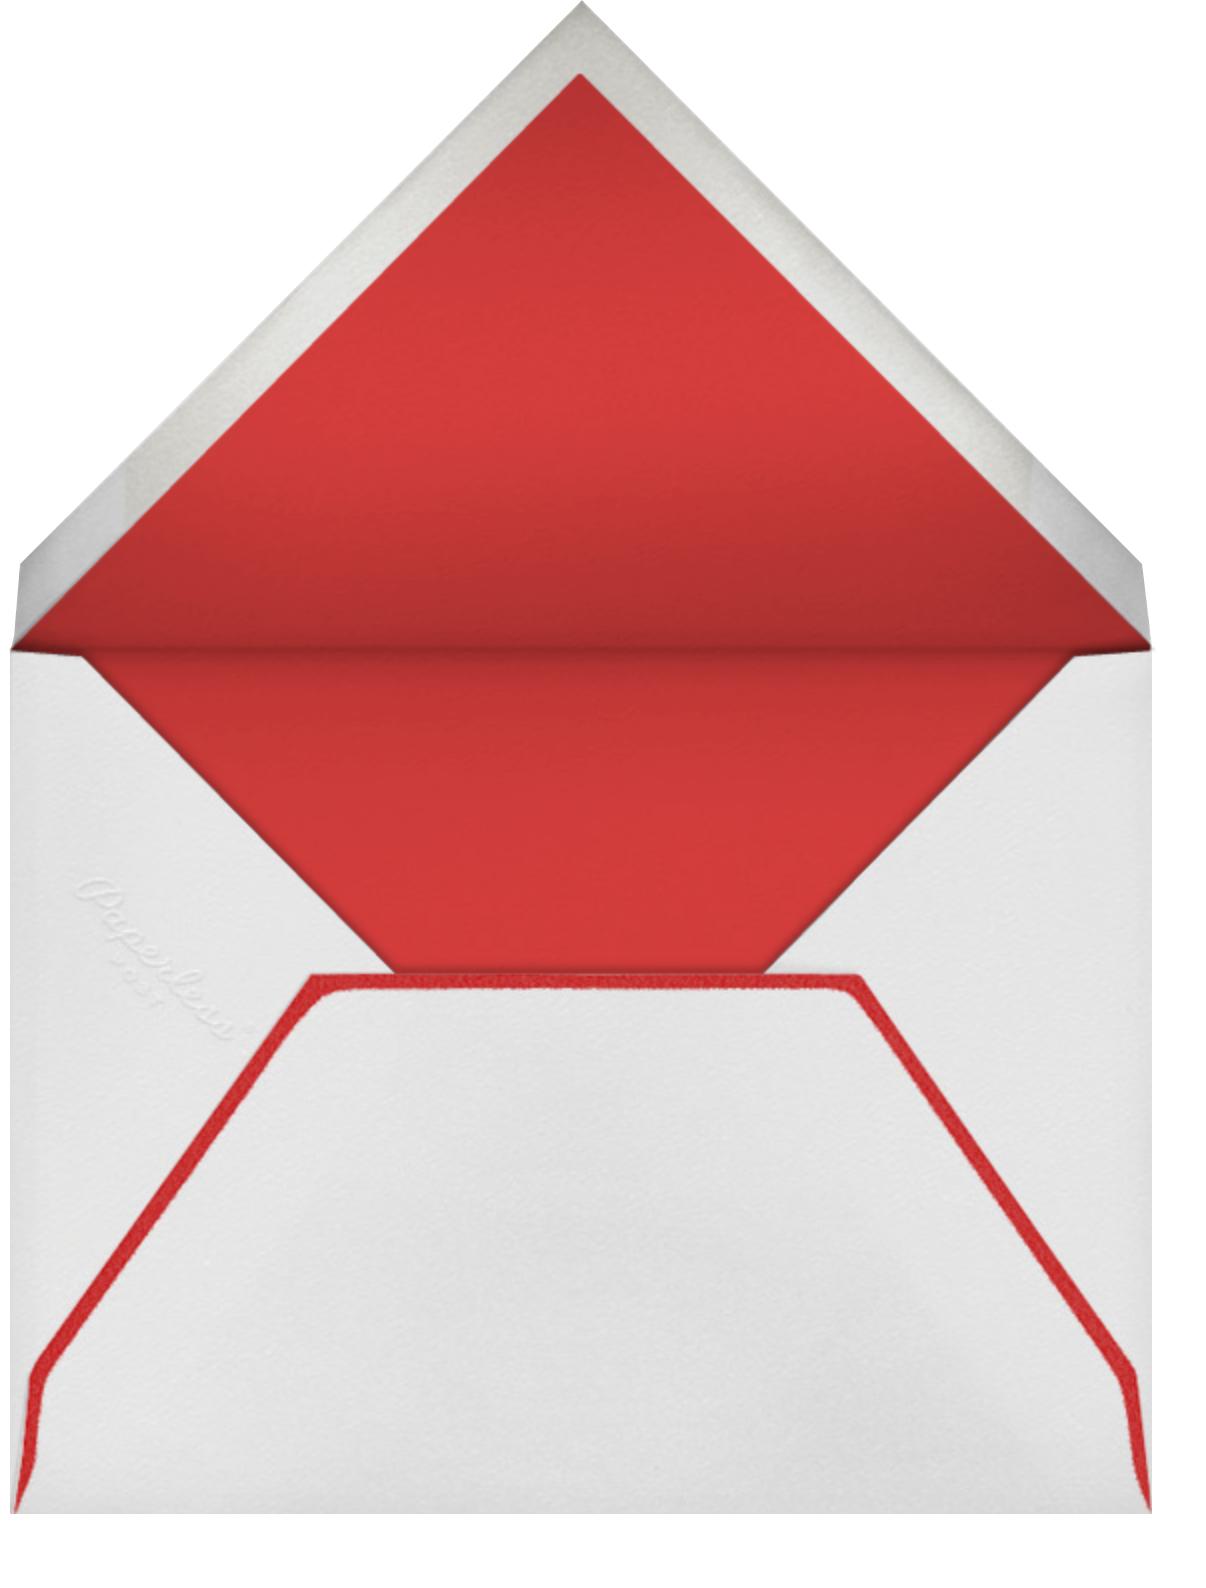 Mom and Me (Blanca Gomez) - Fair - Red Cap Cards - Envelope